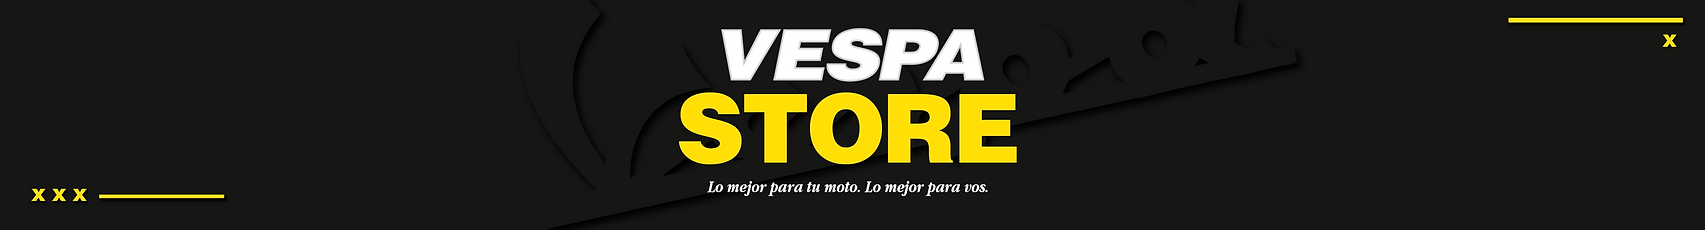 WebVespaStore-01-19.png